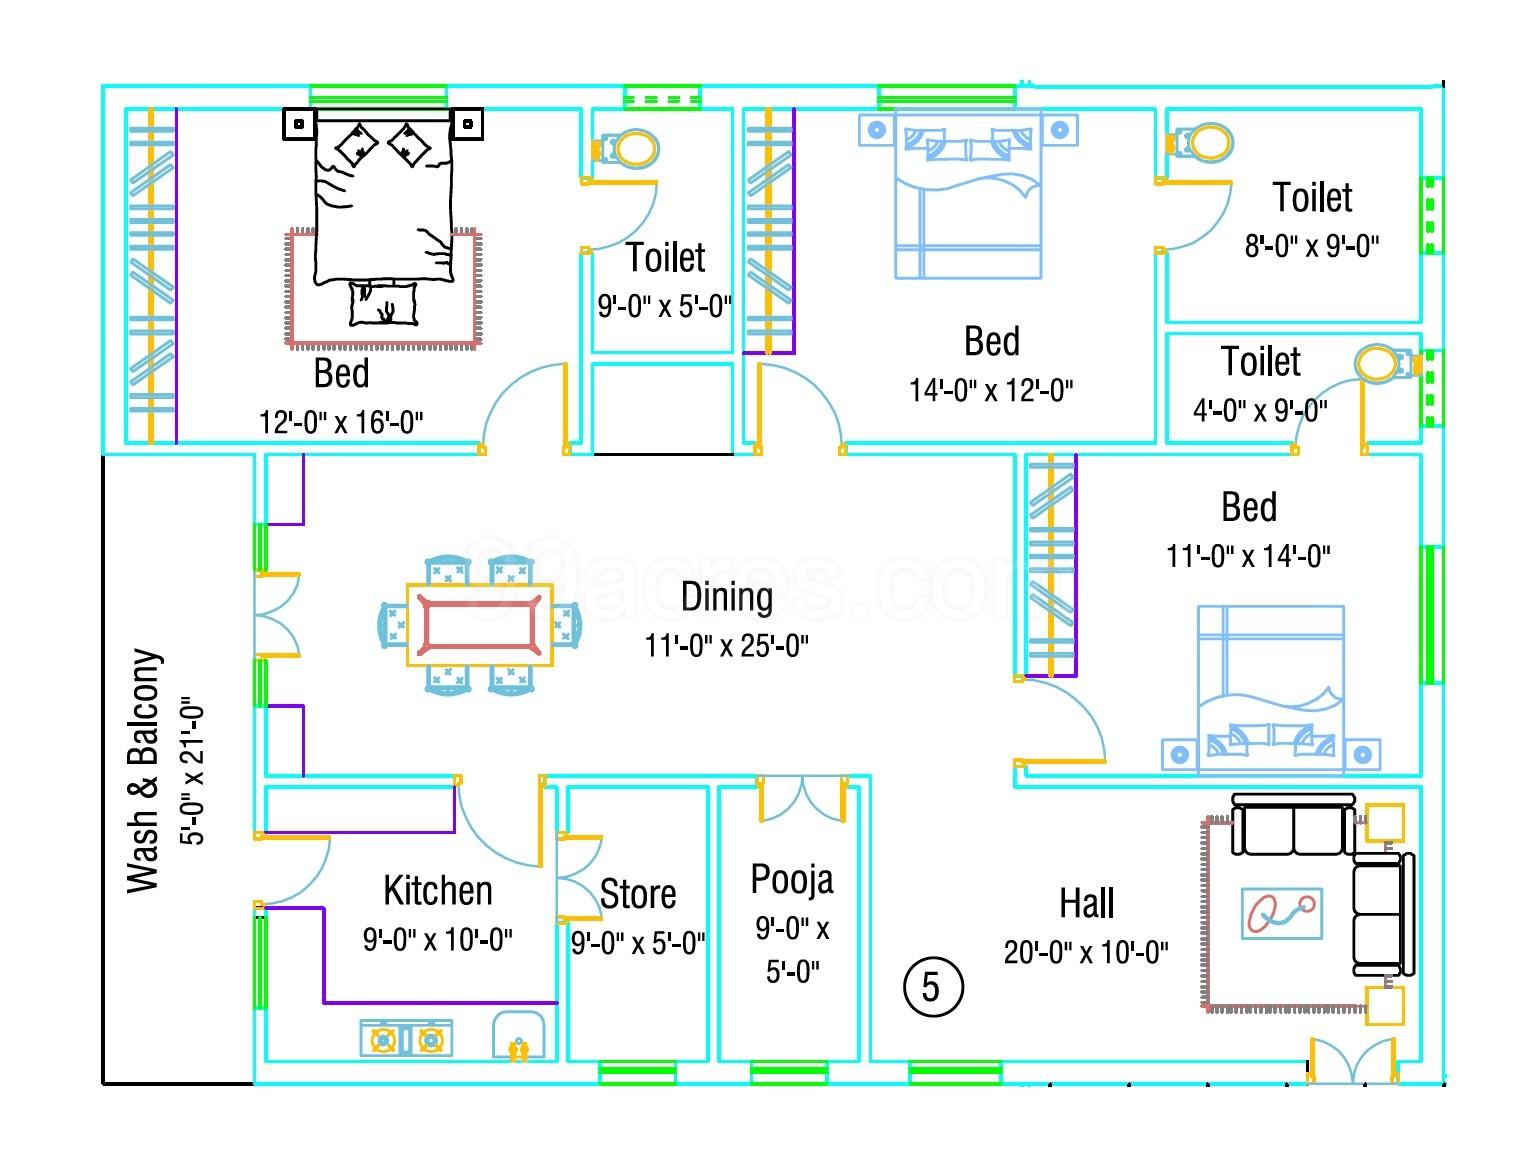 NTR Housing Dhanalakshmi Towers Floor Plan - Dhanalakshmi